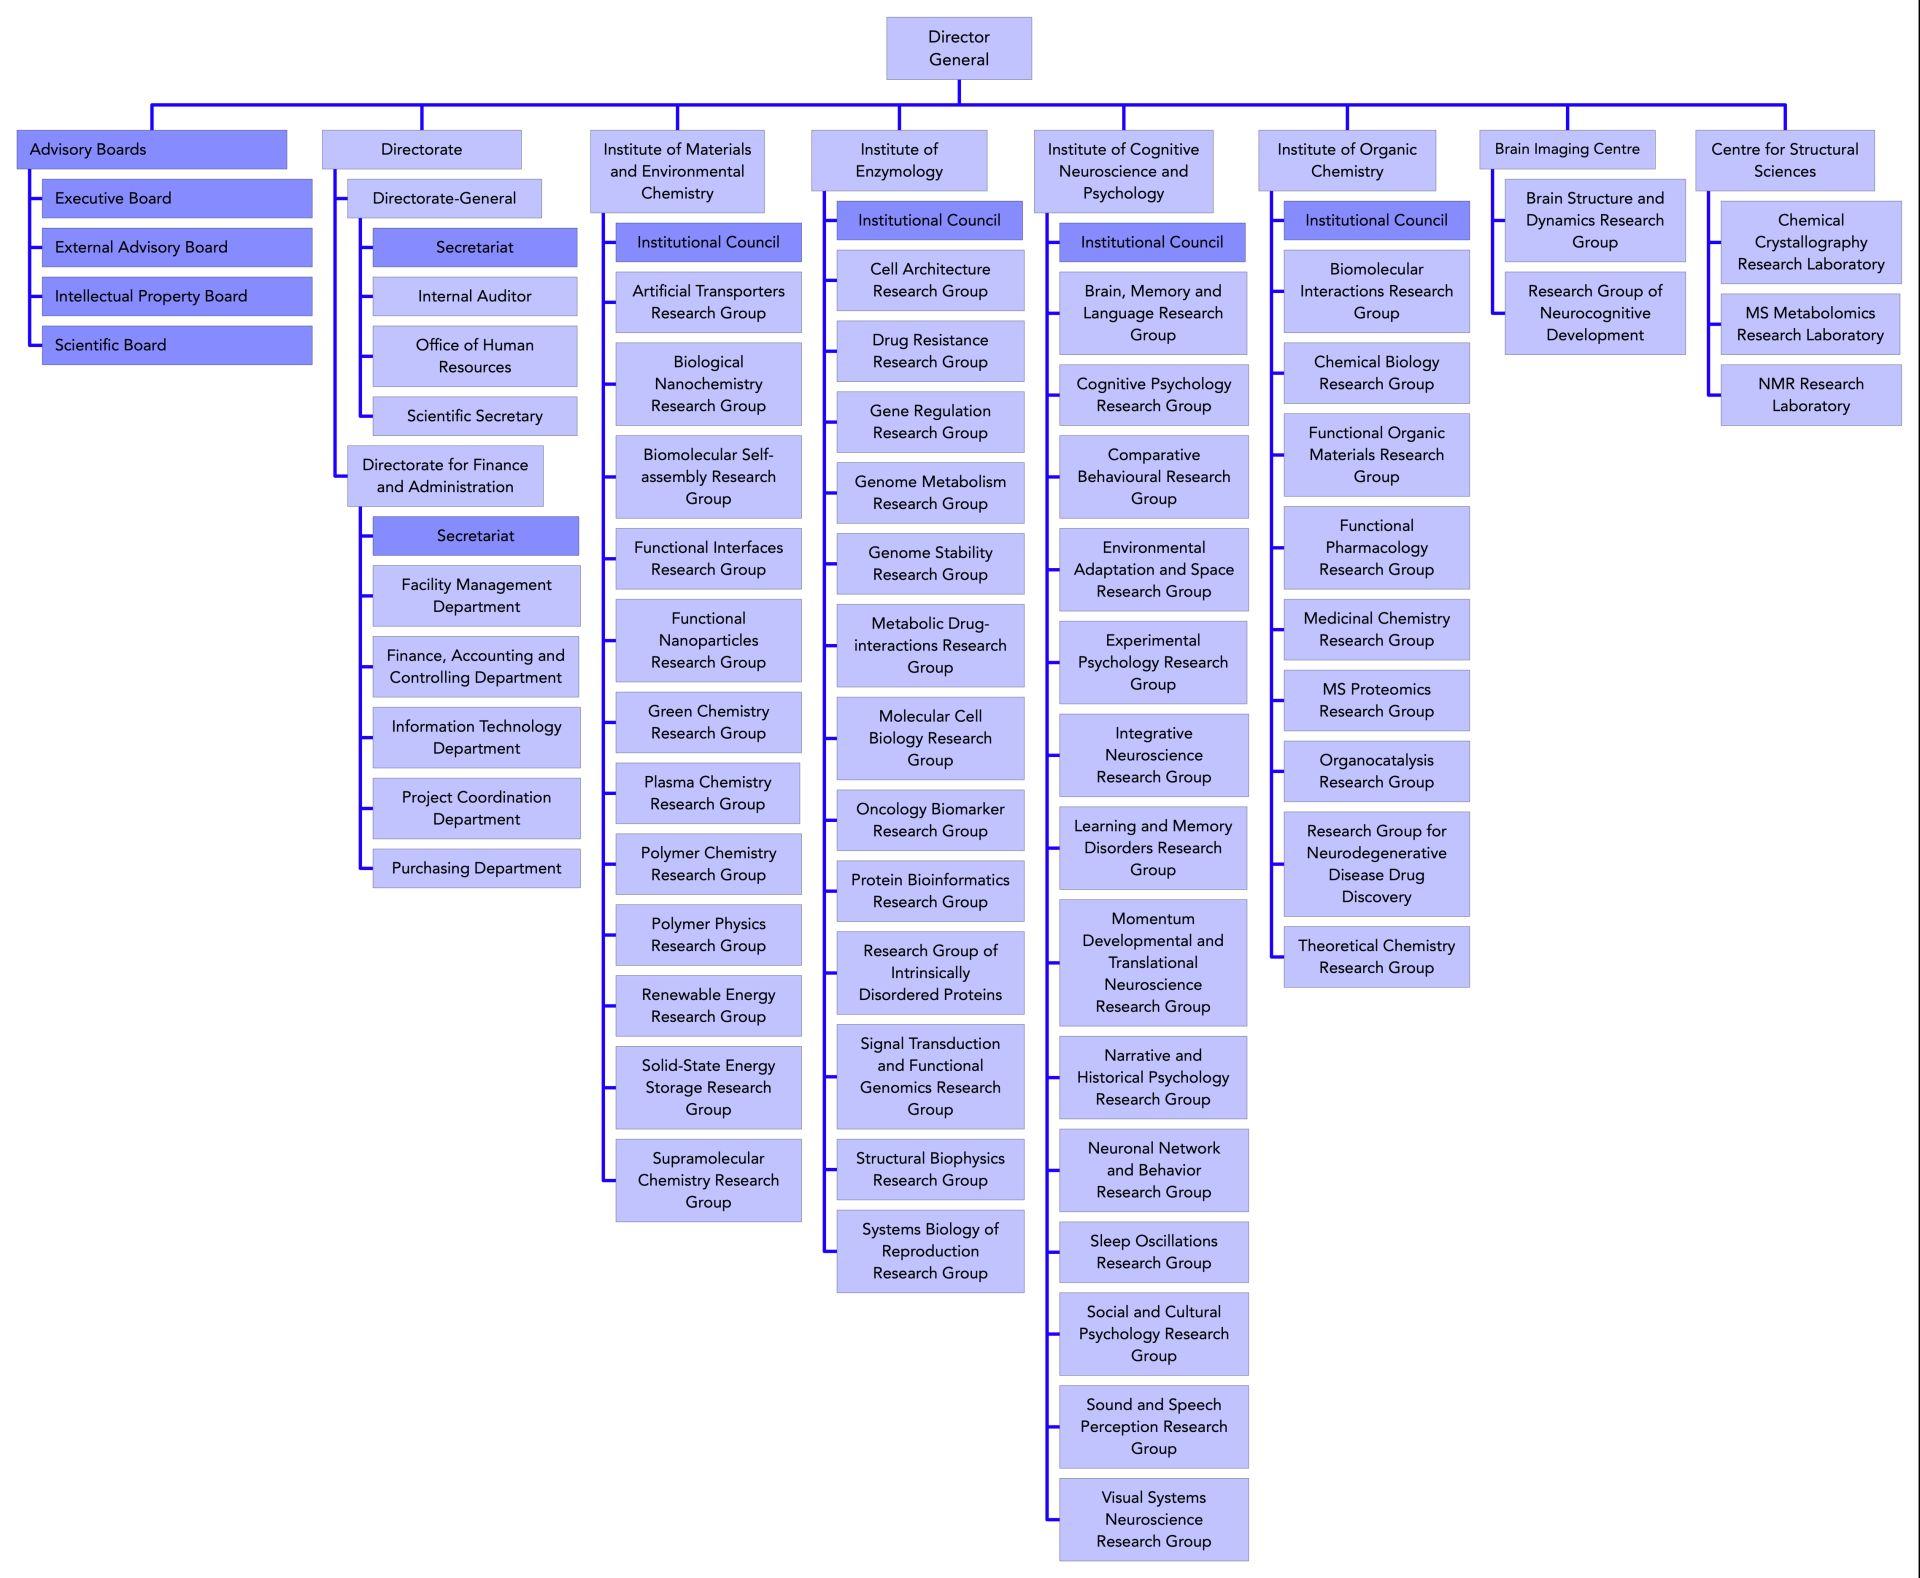 TTK organogram